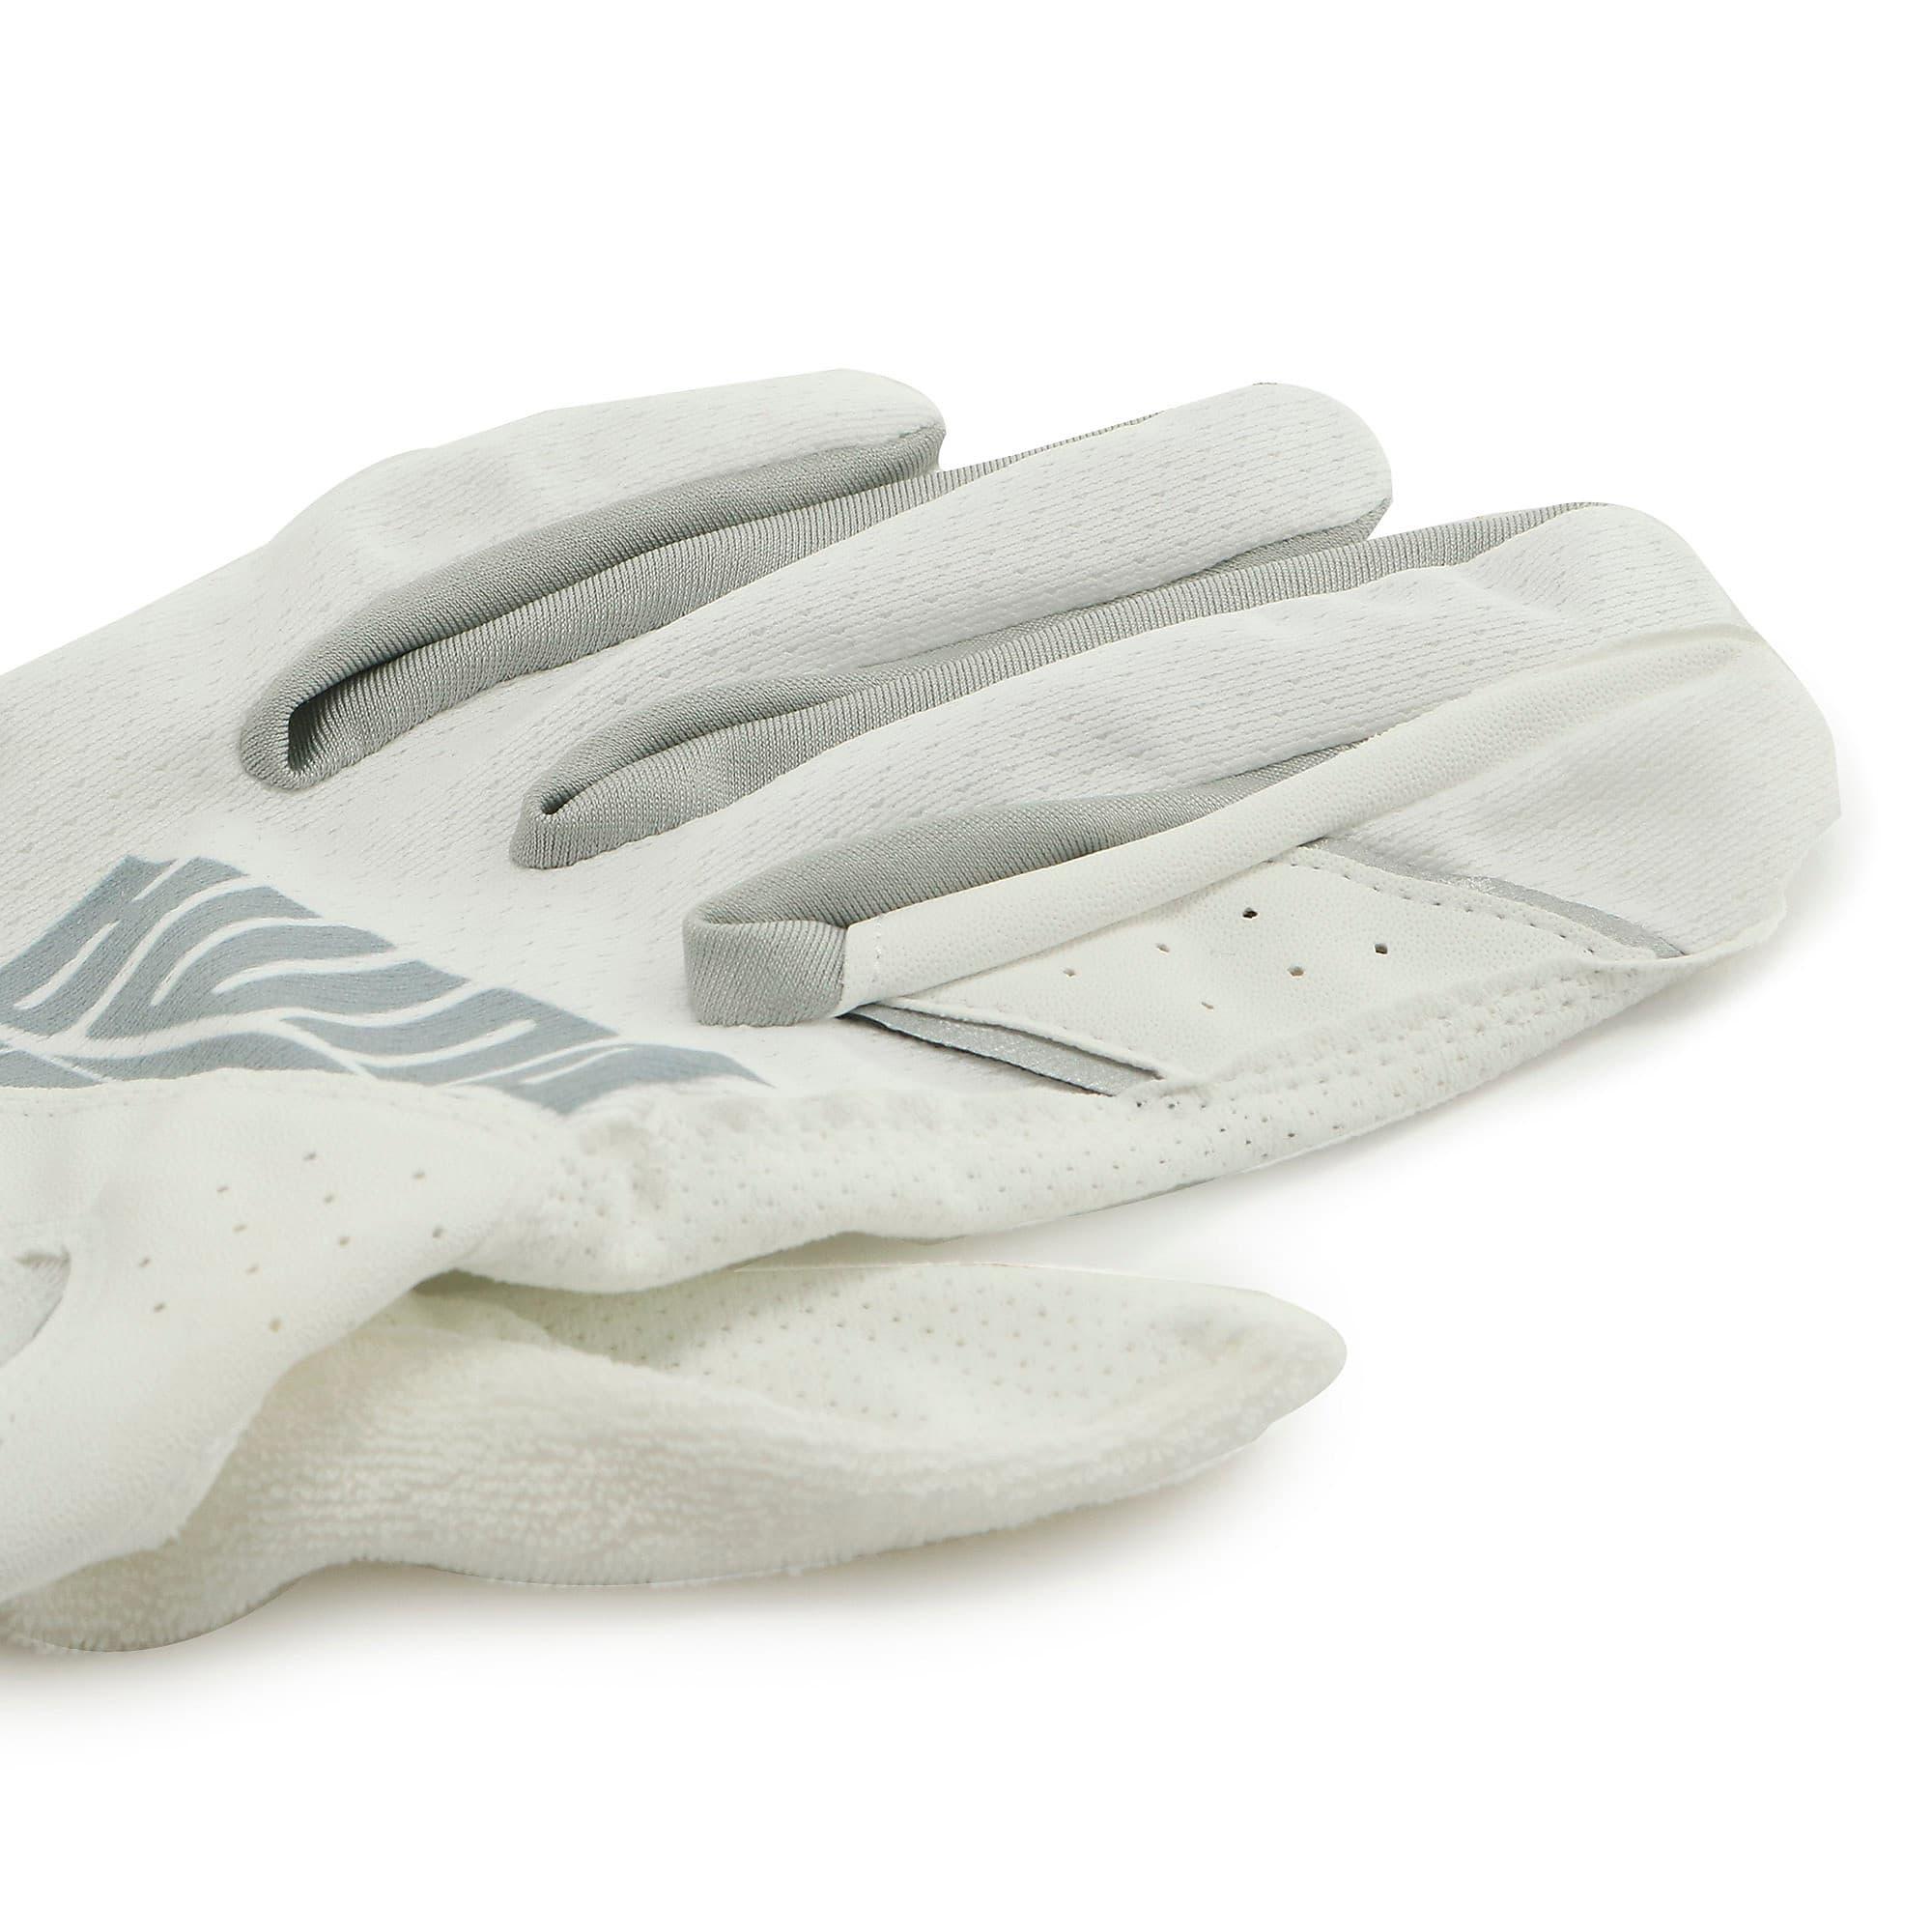 Thumbnail 4 of ゴルフ 3D サマー グローブ, White / Silver, medium-JPN